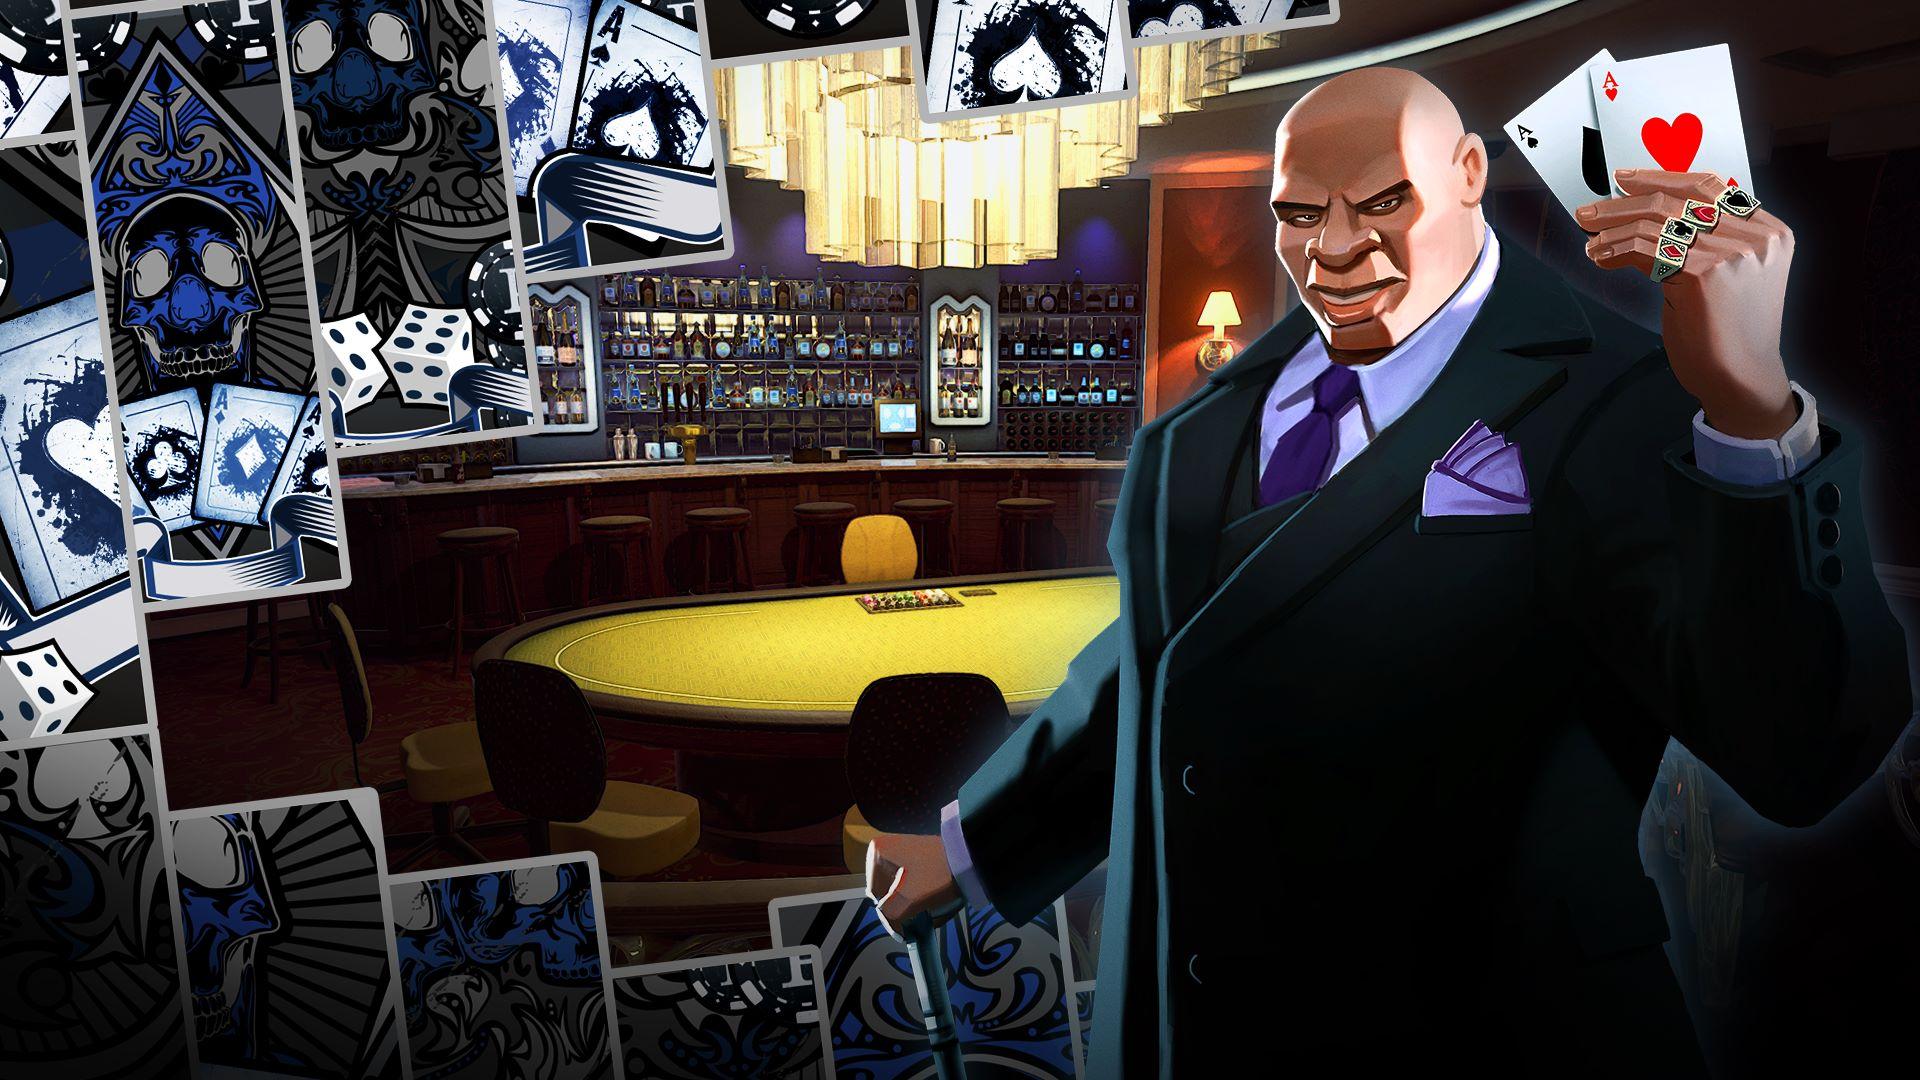 Top 5 videogiochi dedicati al Poker Texas Hold'em - Prominence Poker